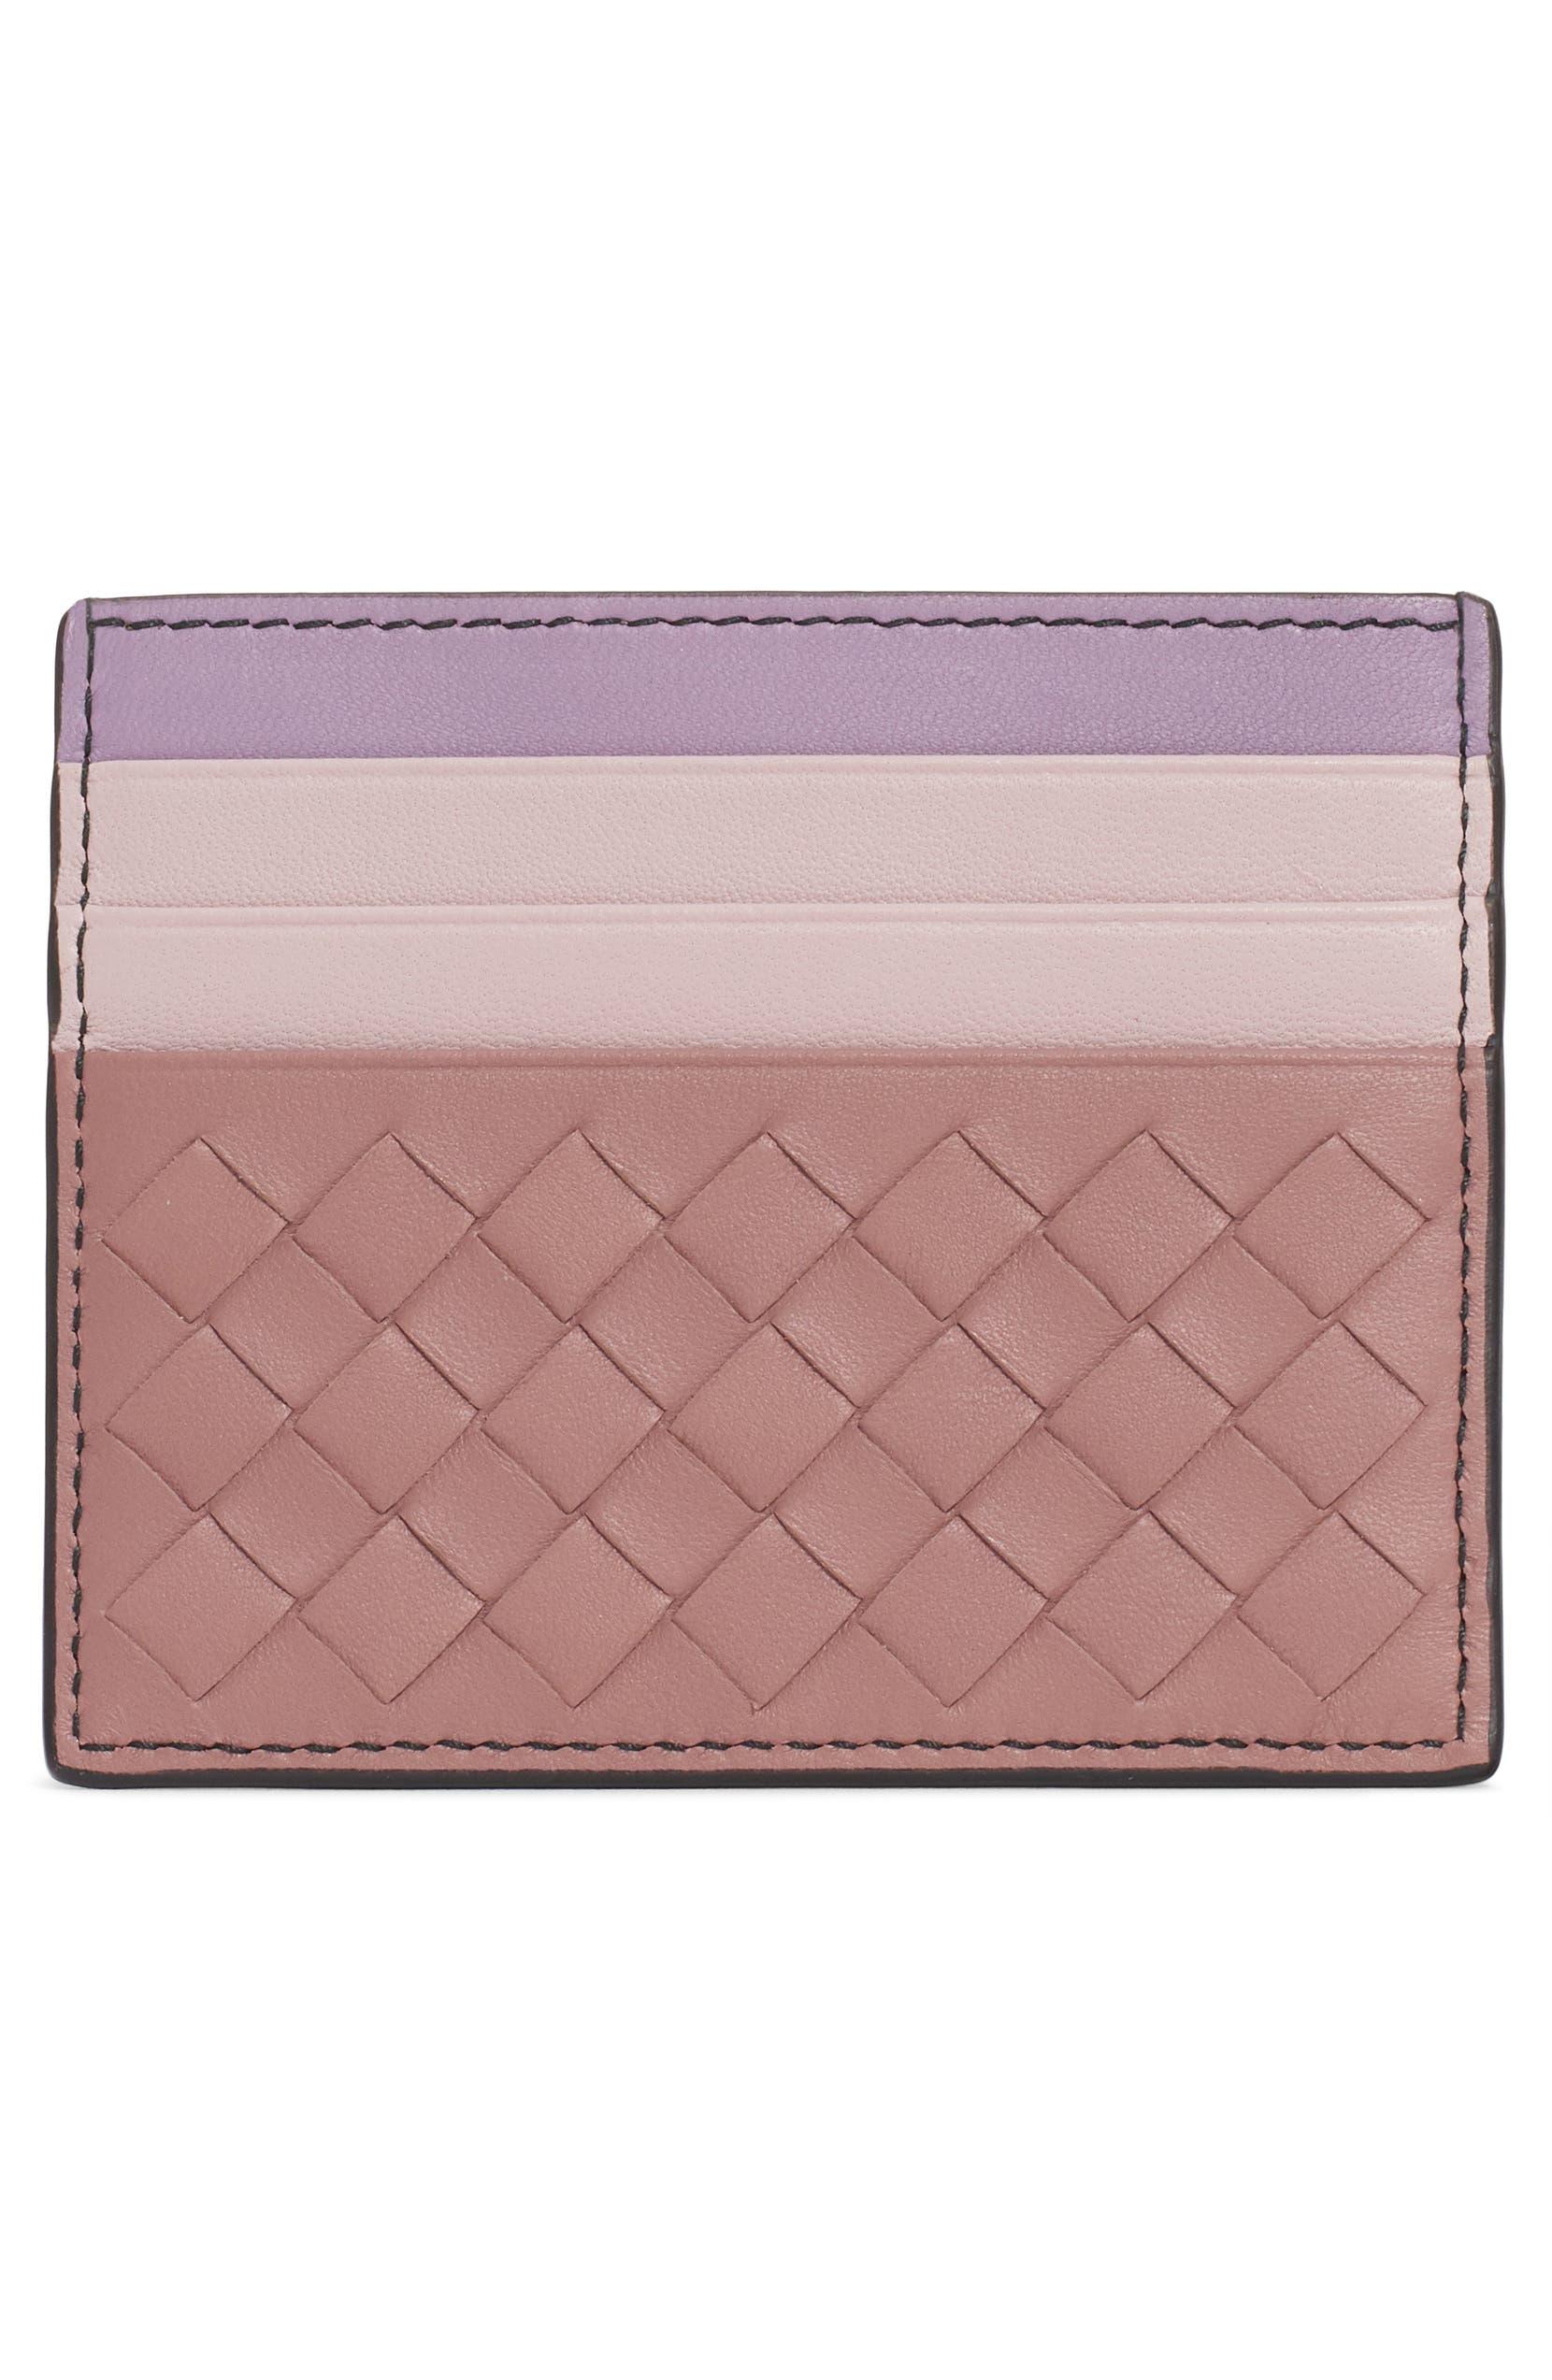 11defa257f787 Bottega Veneta Flat Card Case | Nordstrom